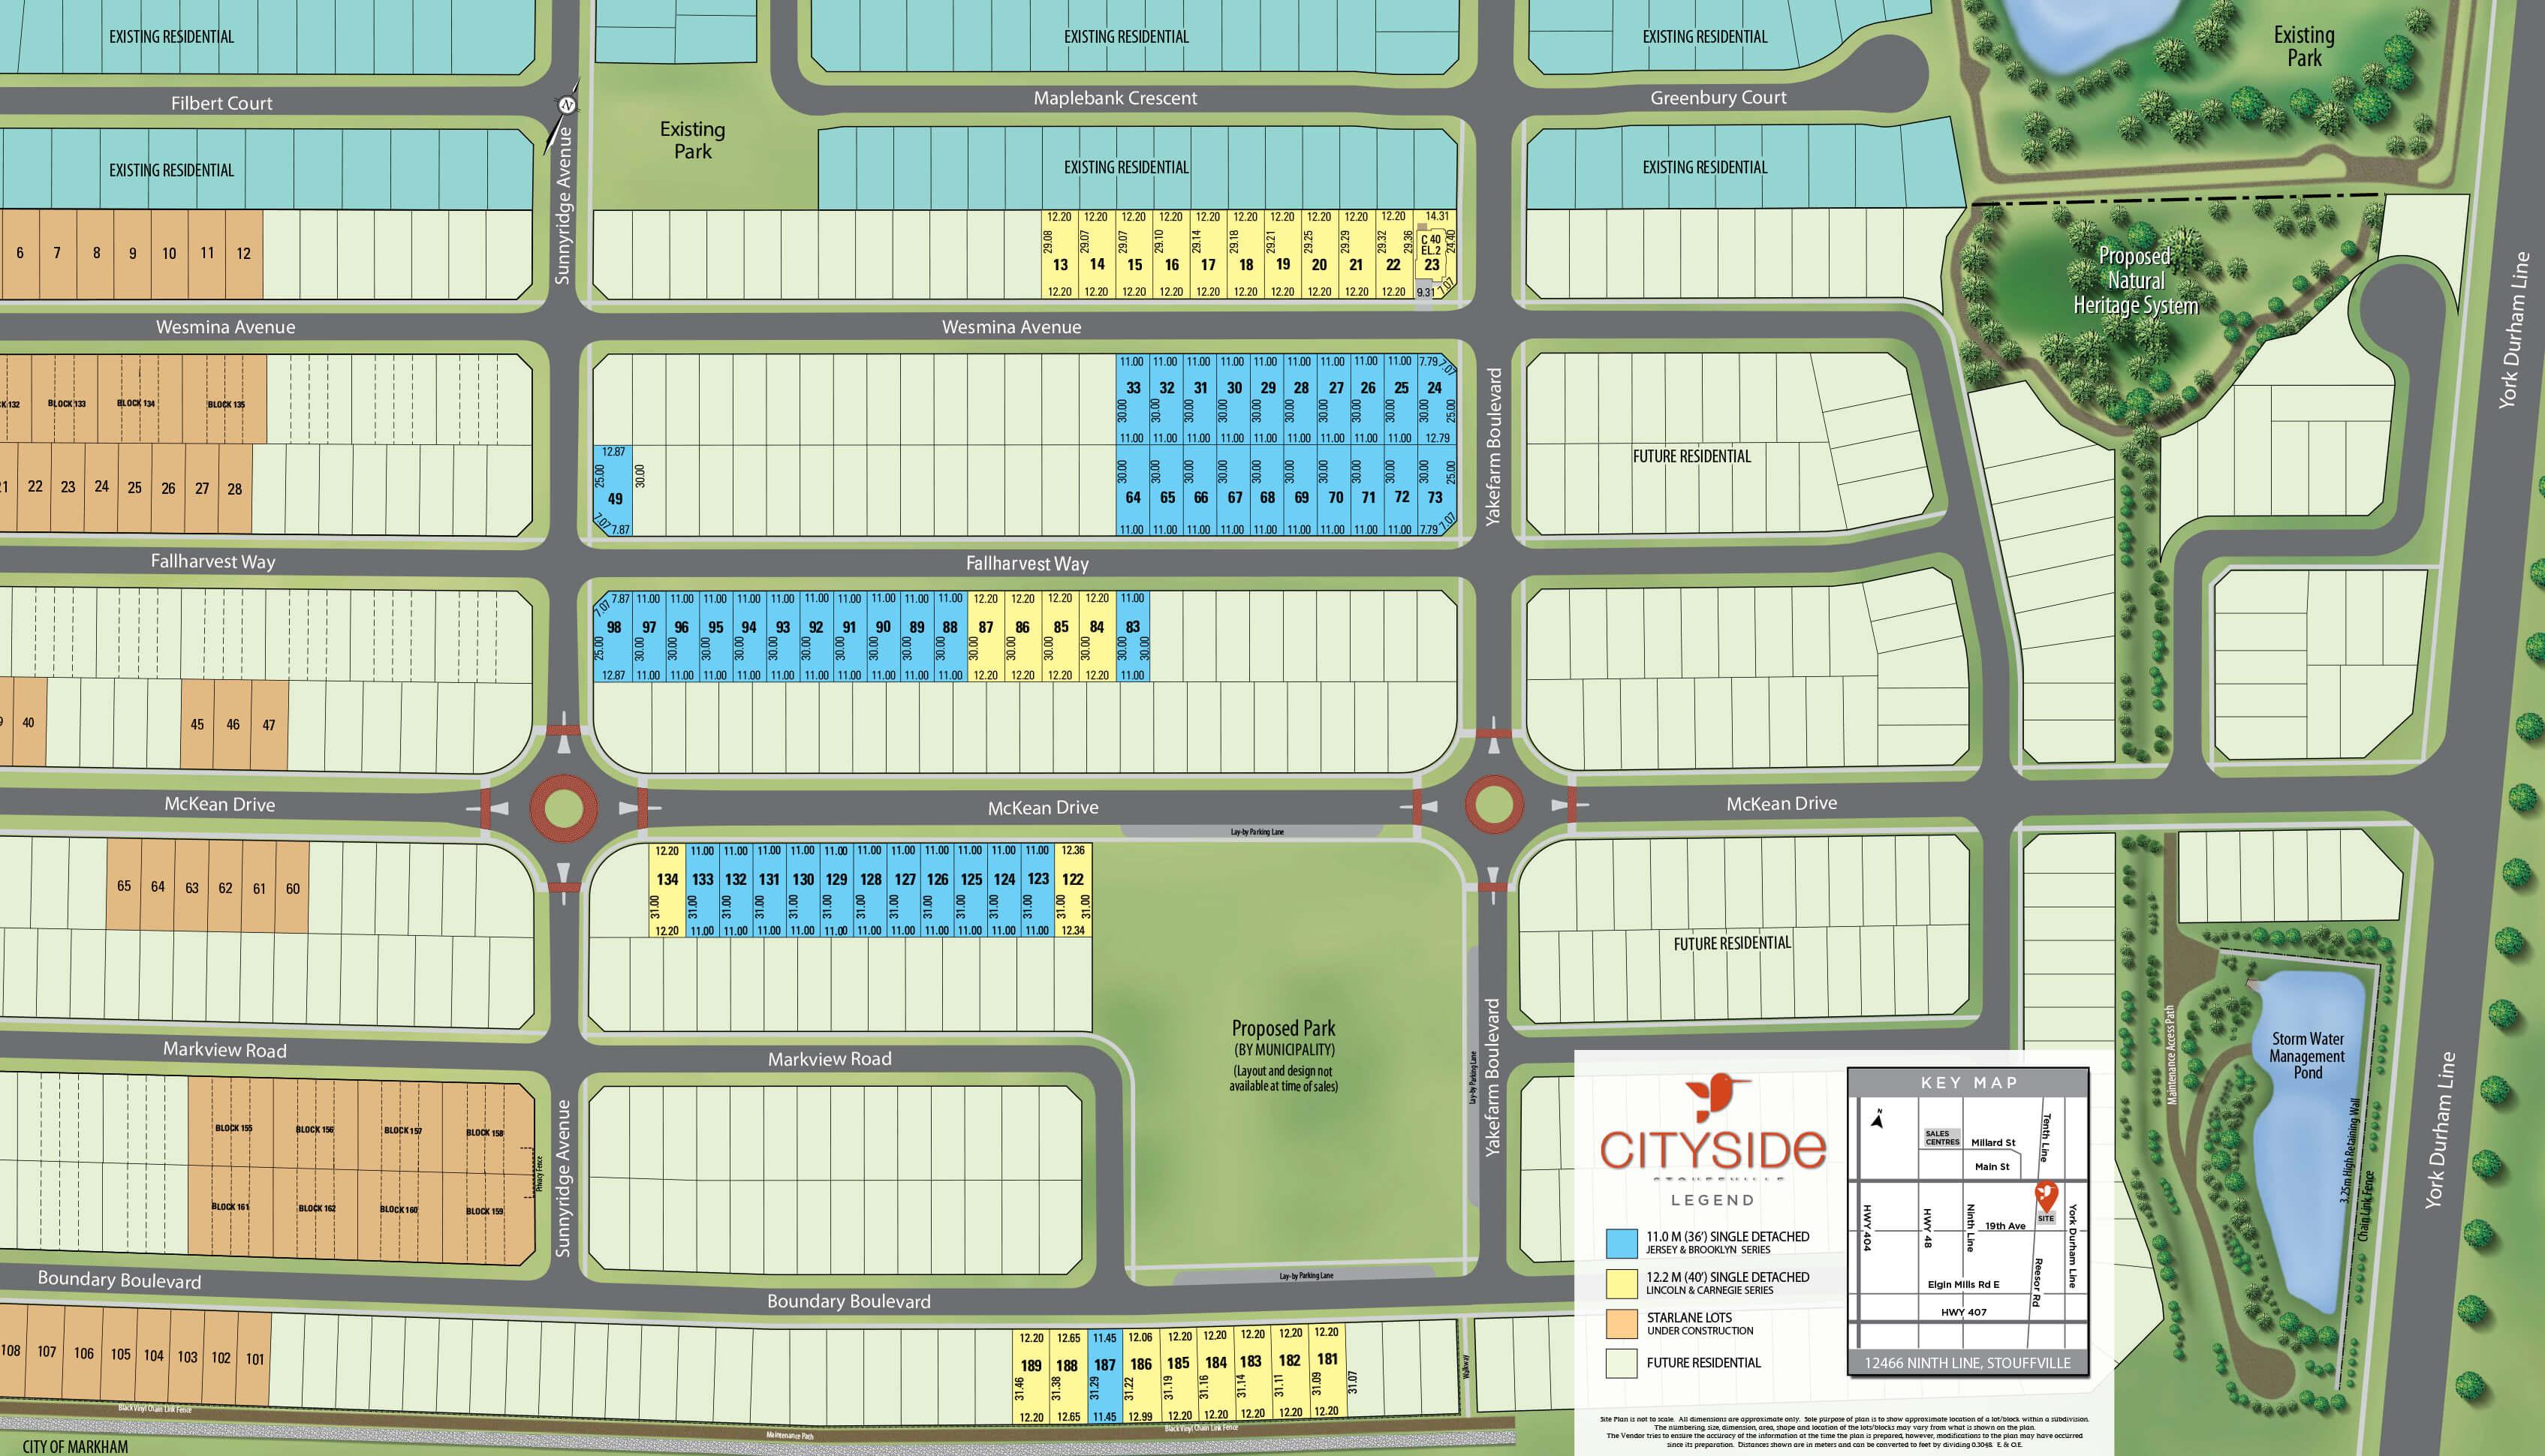 Cityside Site Plan